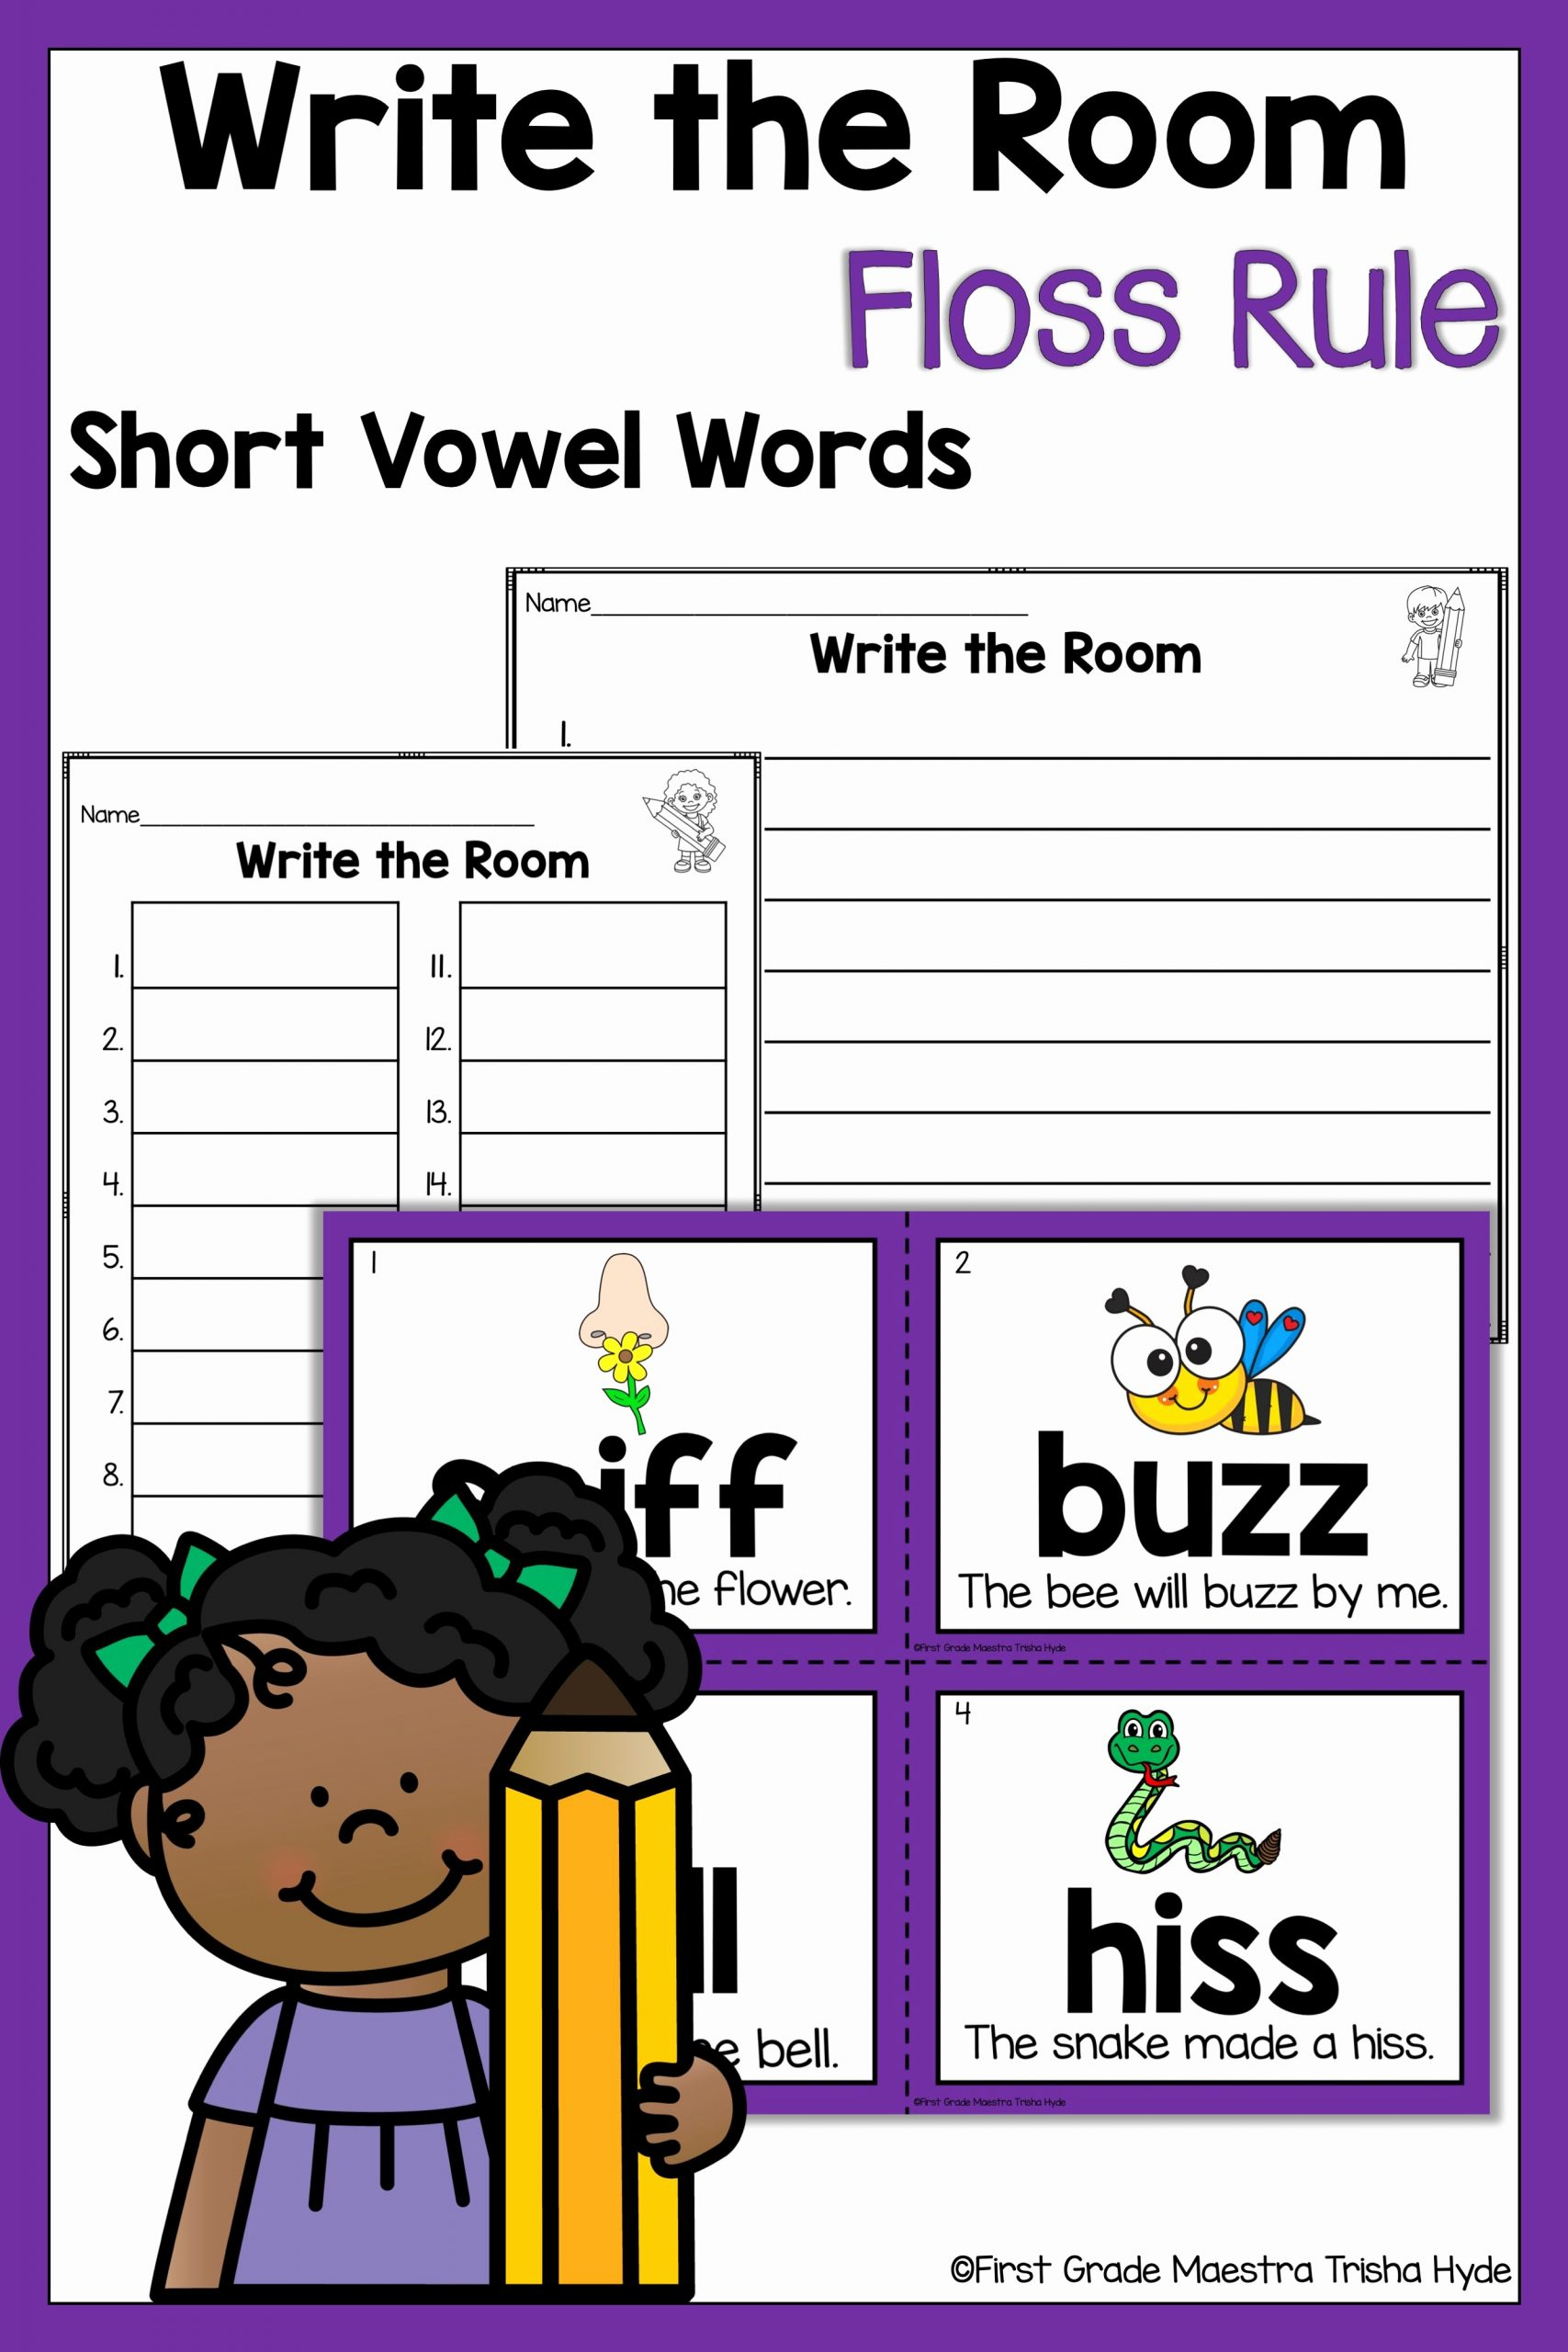 Phonics Floss Rule Worksheet New Write the Room Floss Rule